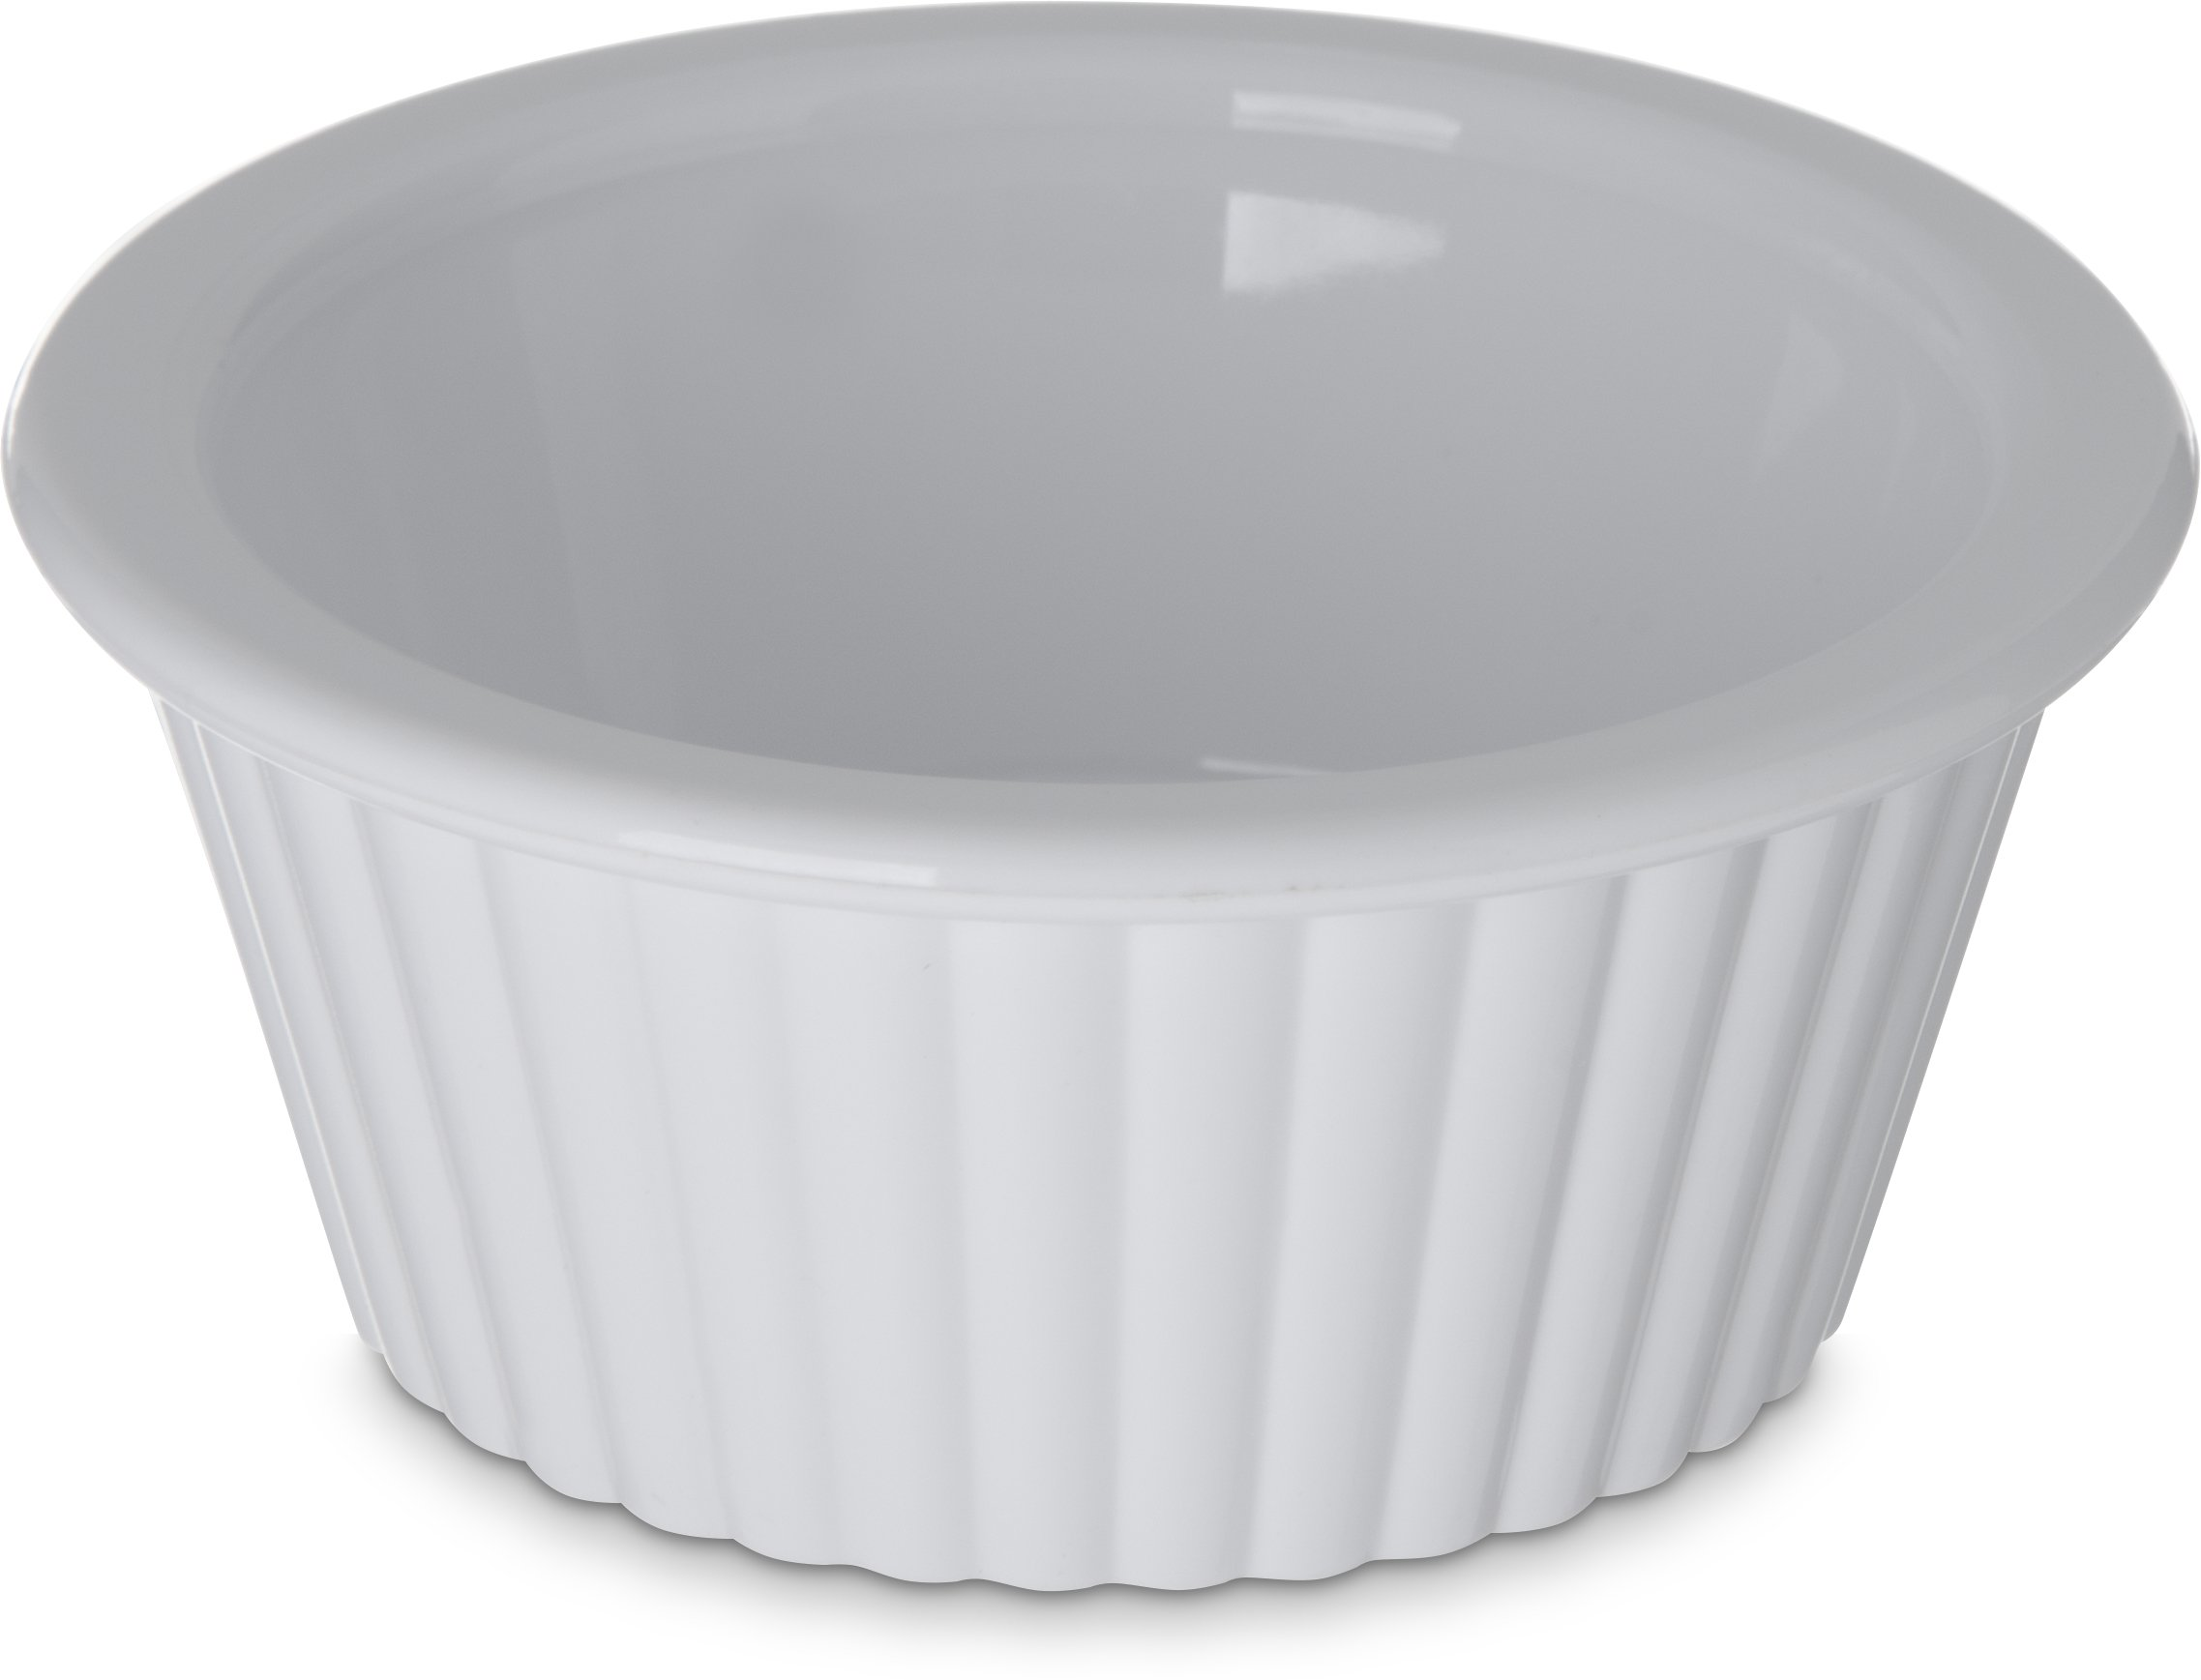 Carlisle 084302 SAN Fluted Ramekin, 1 oz Capacity, White (Case of 48)